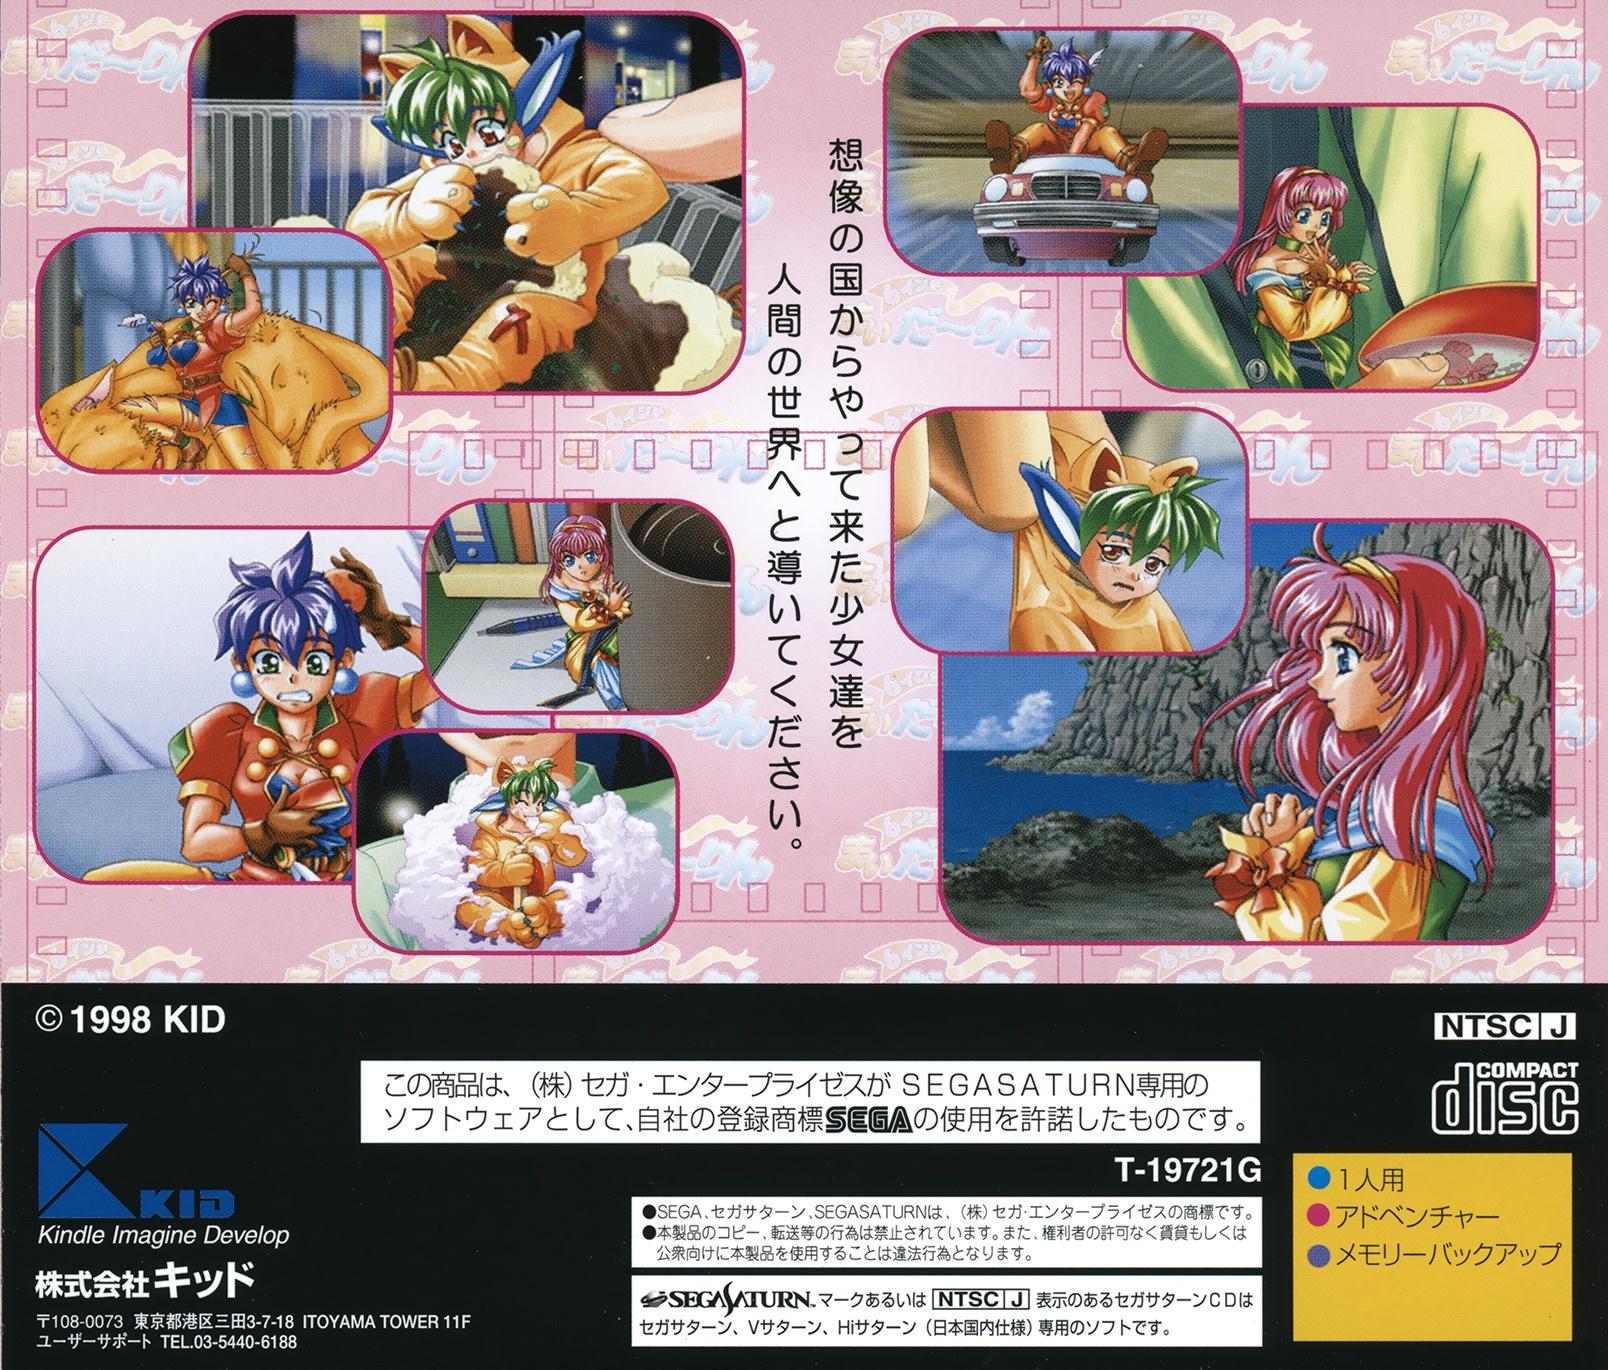 Face arriere du boxart du jeu 6 Inch My Darling (Japon) sur Sega Saturn